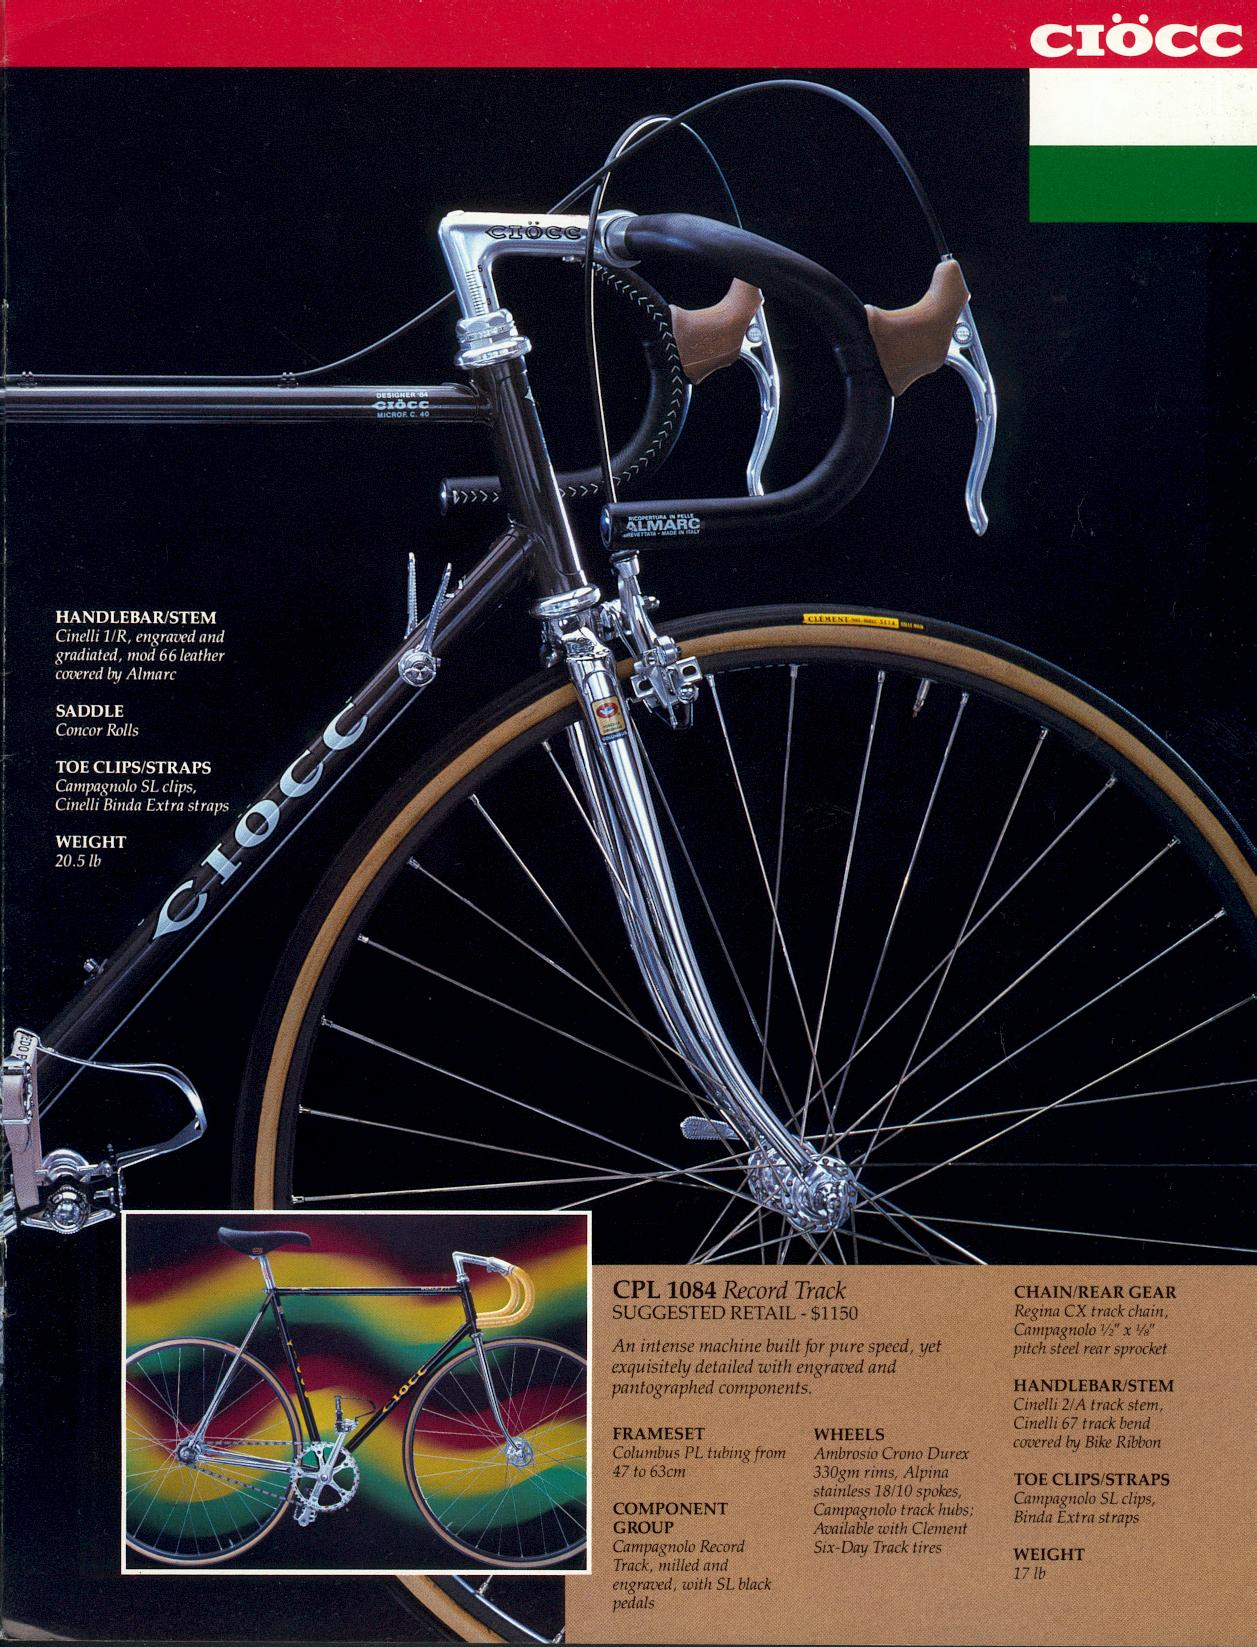 Cannondale Bikes For Sale >> vintage ciocc roadbike catalog – saarf.london